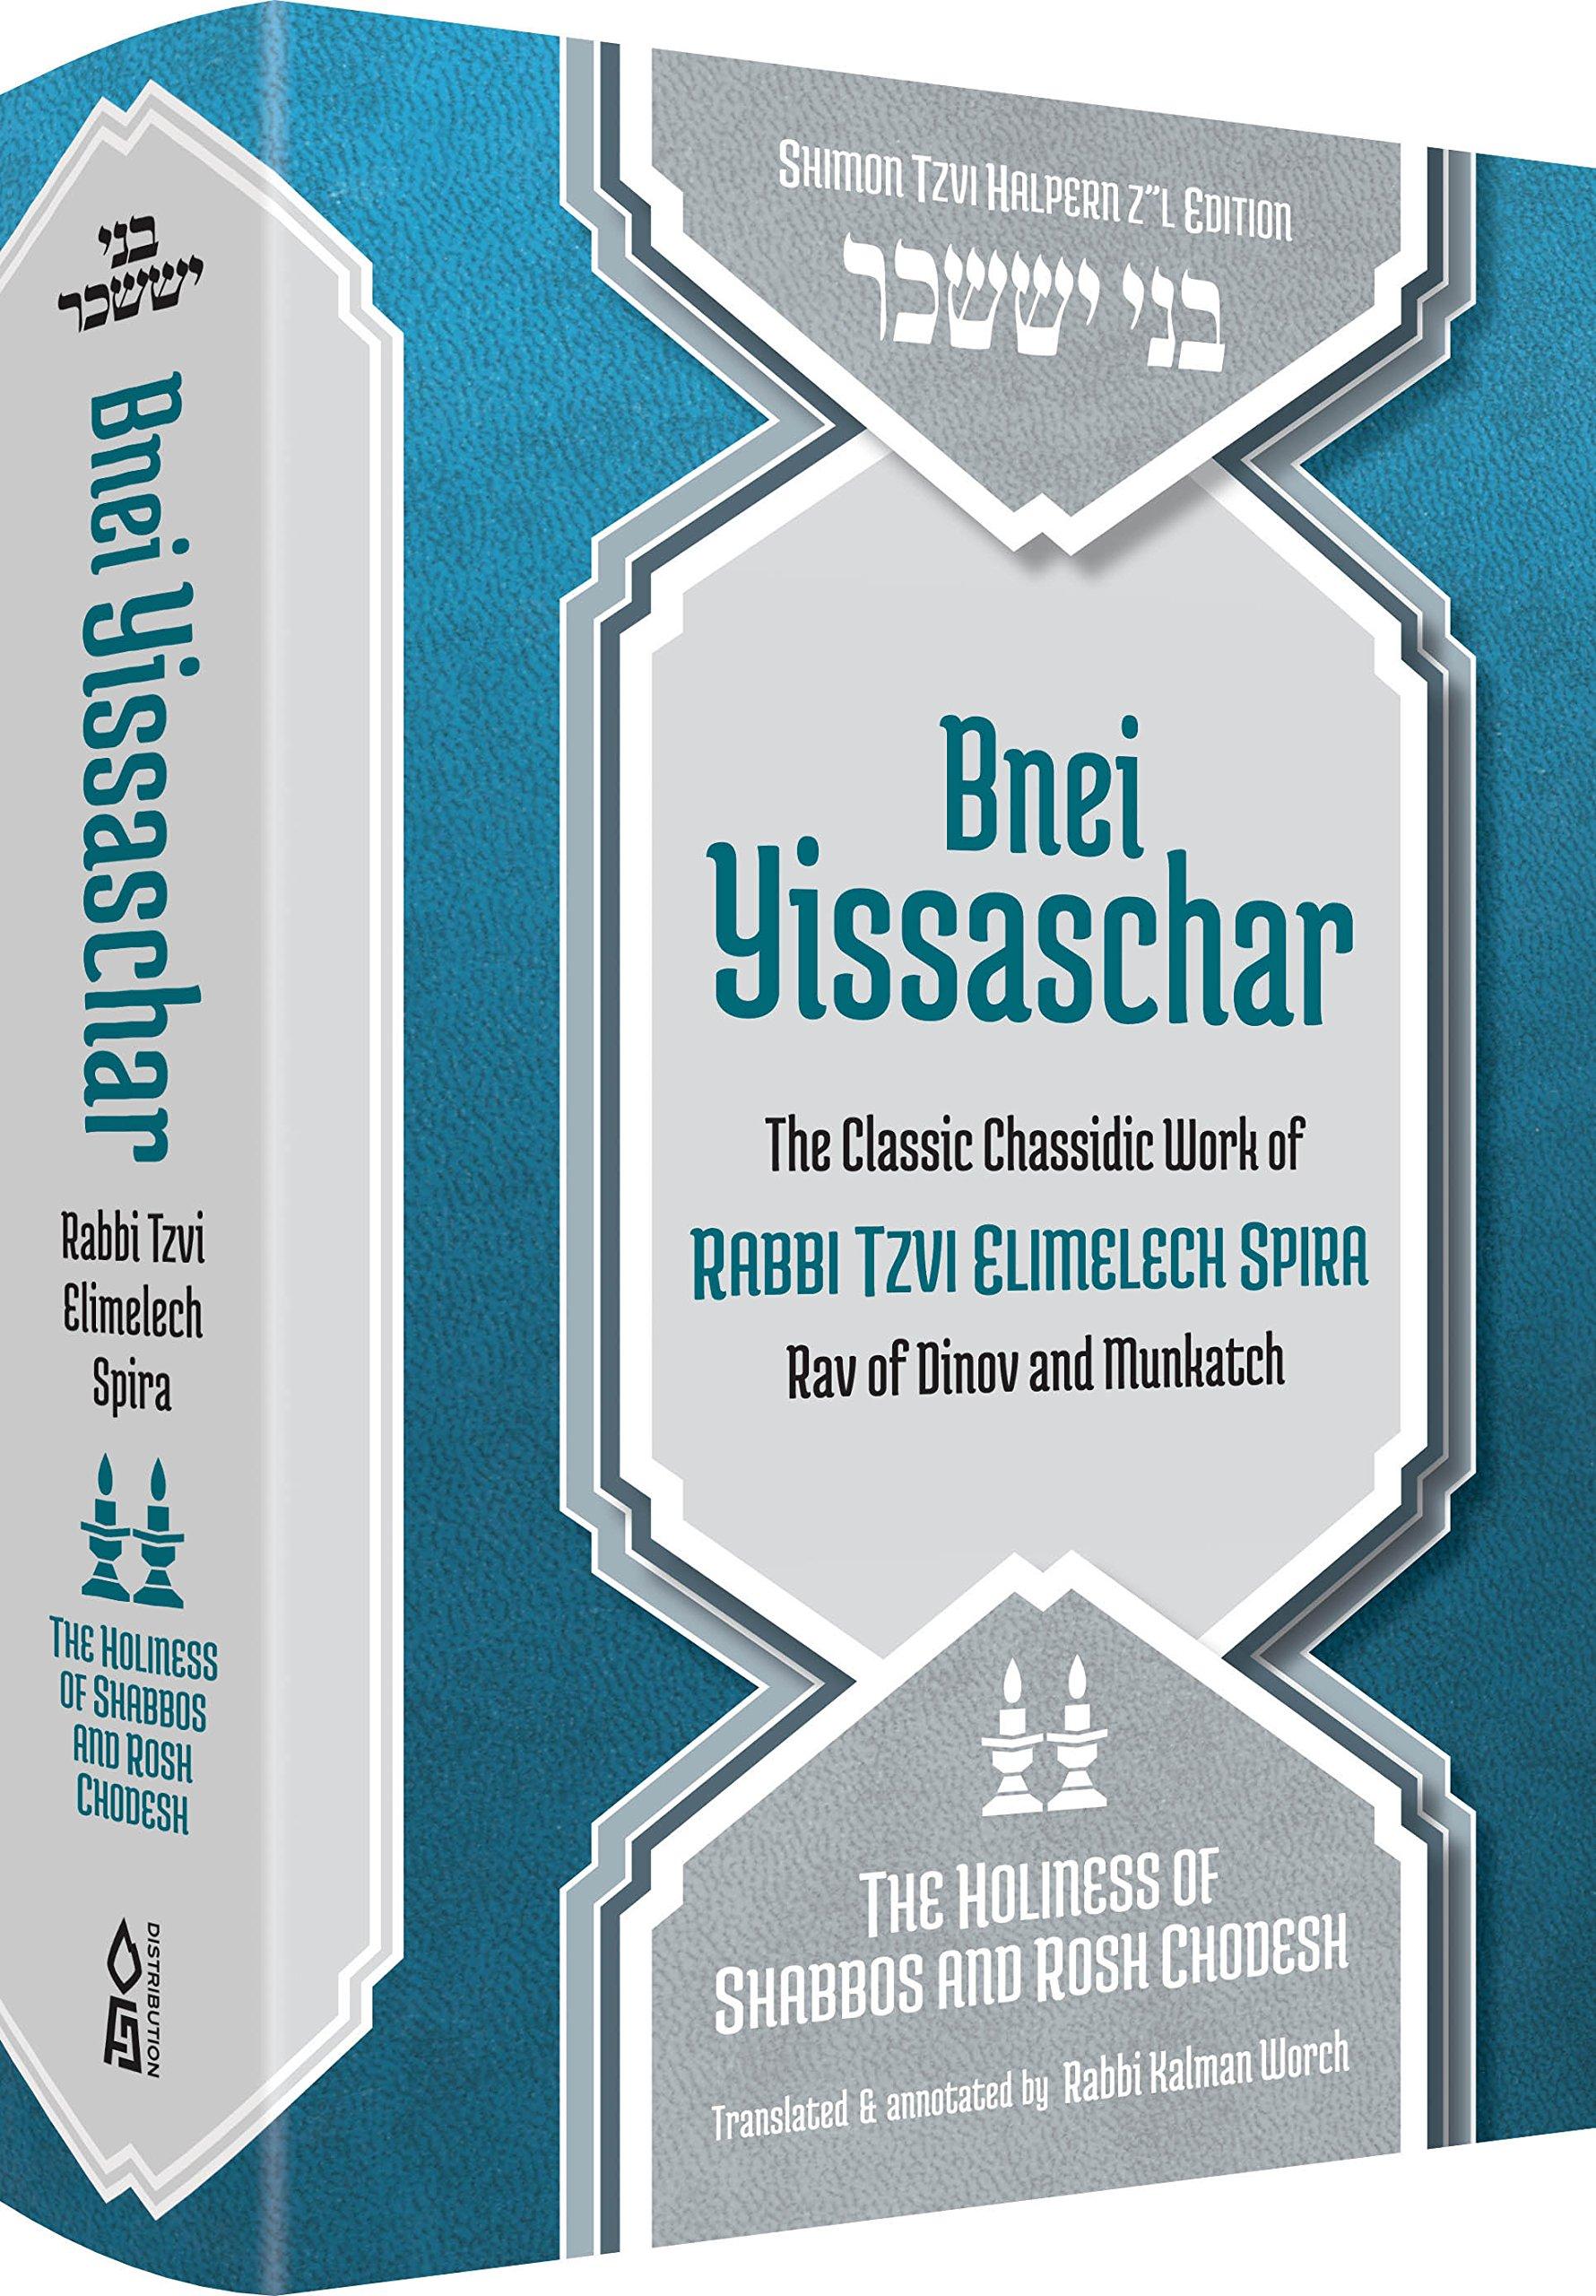 Read Online Bnei Yisaschar: The Classic Chassidic Work of Rabbi Tzvi Elimelech Spira, Rav of Dinov and Munkatch: The Holiness of Shabbos And Rosh Chodesh ebook